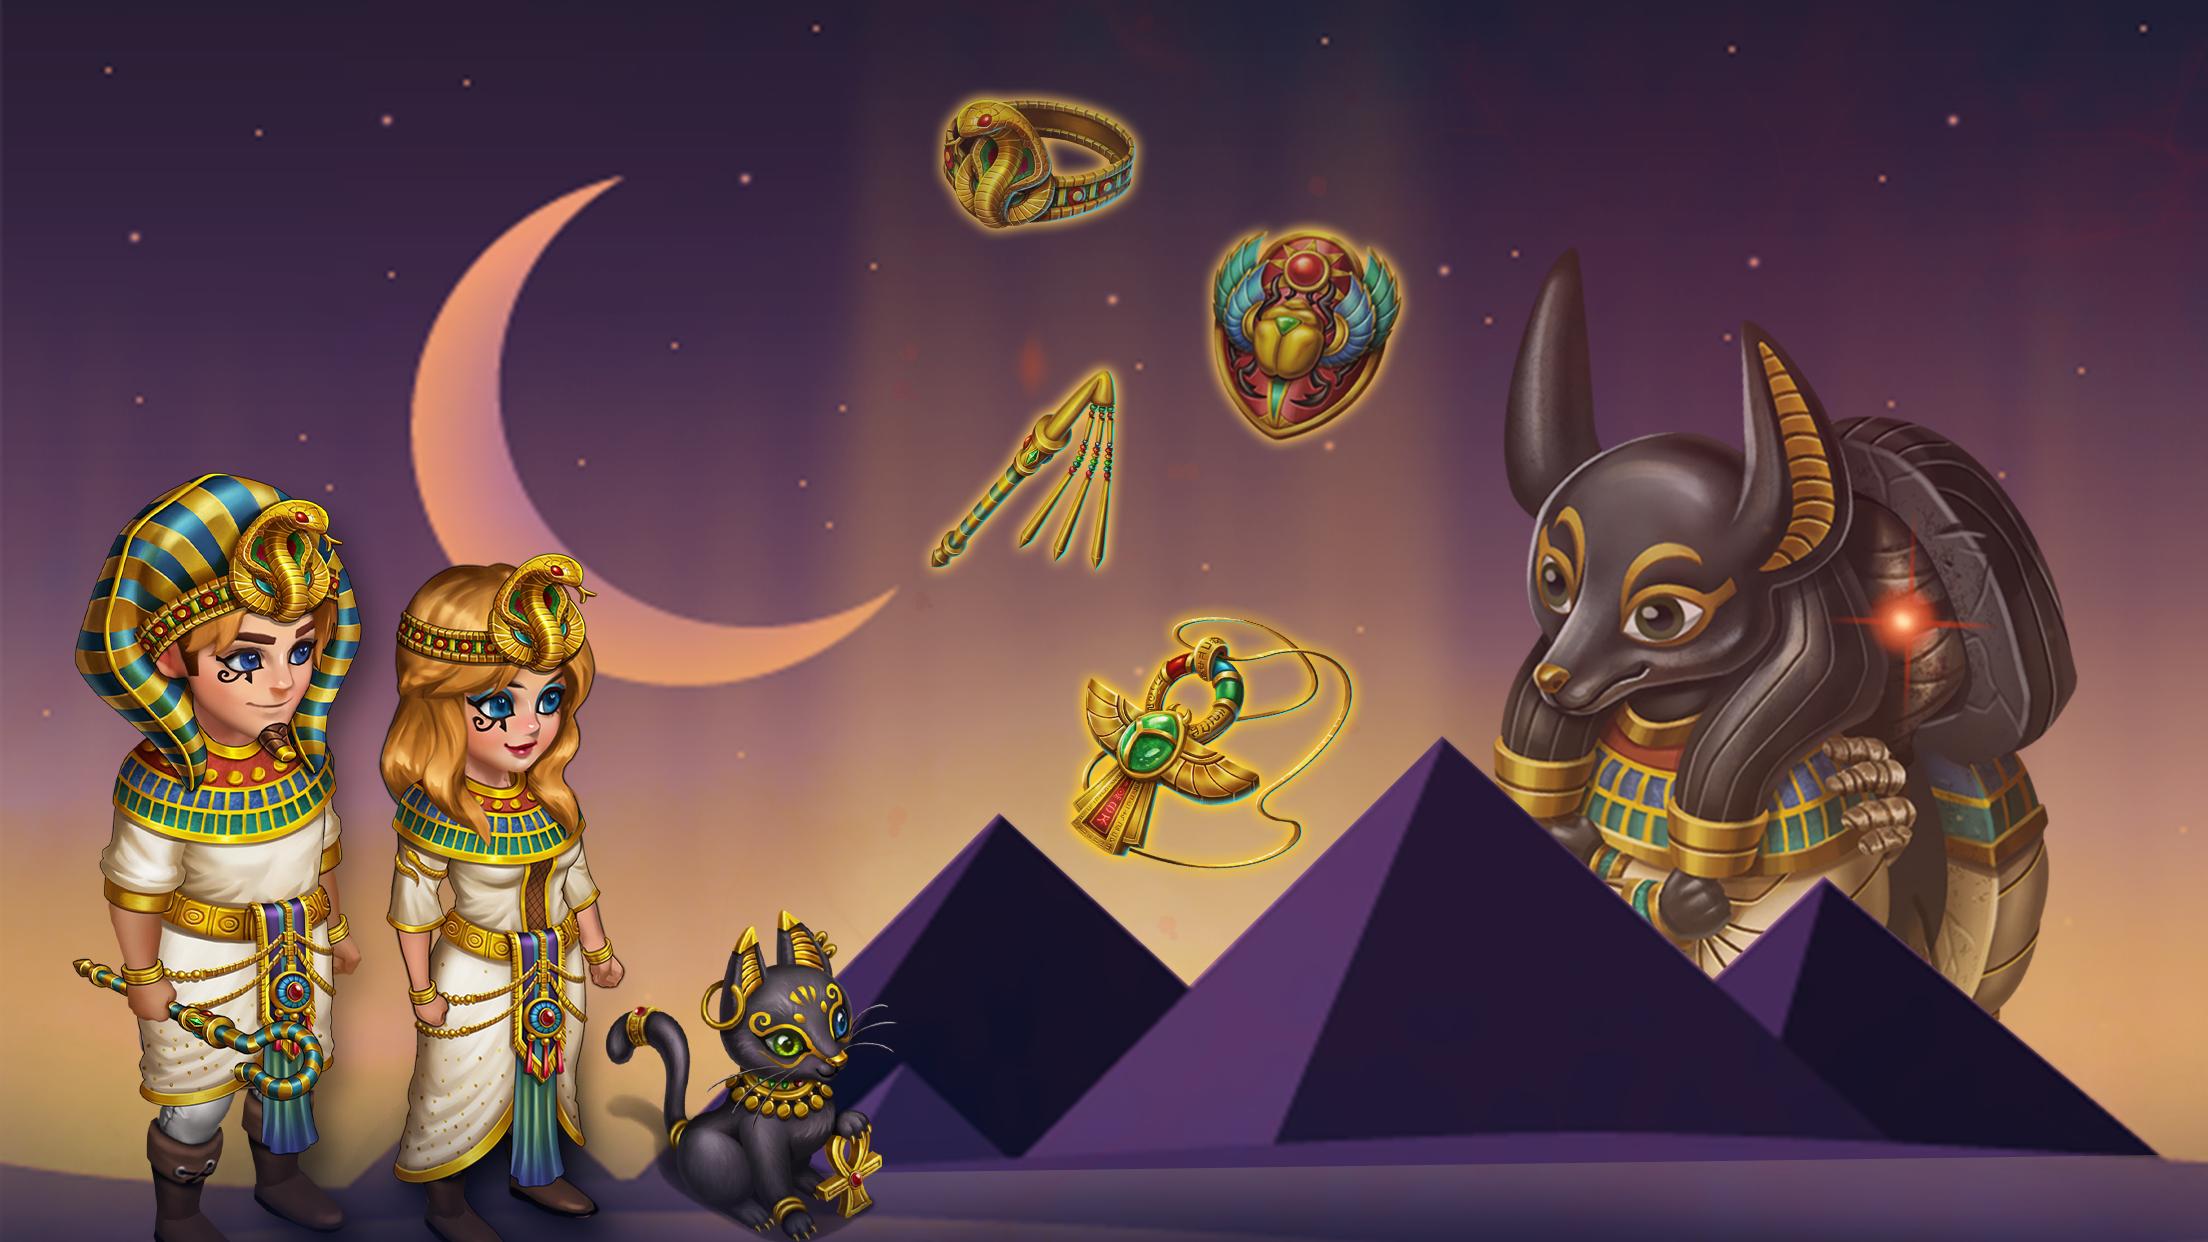 Shop Heroes: Adventure Quest Screenshot